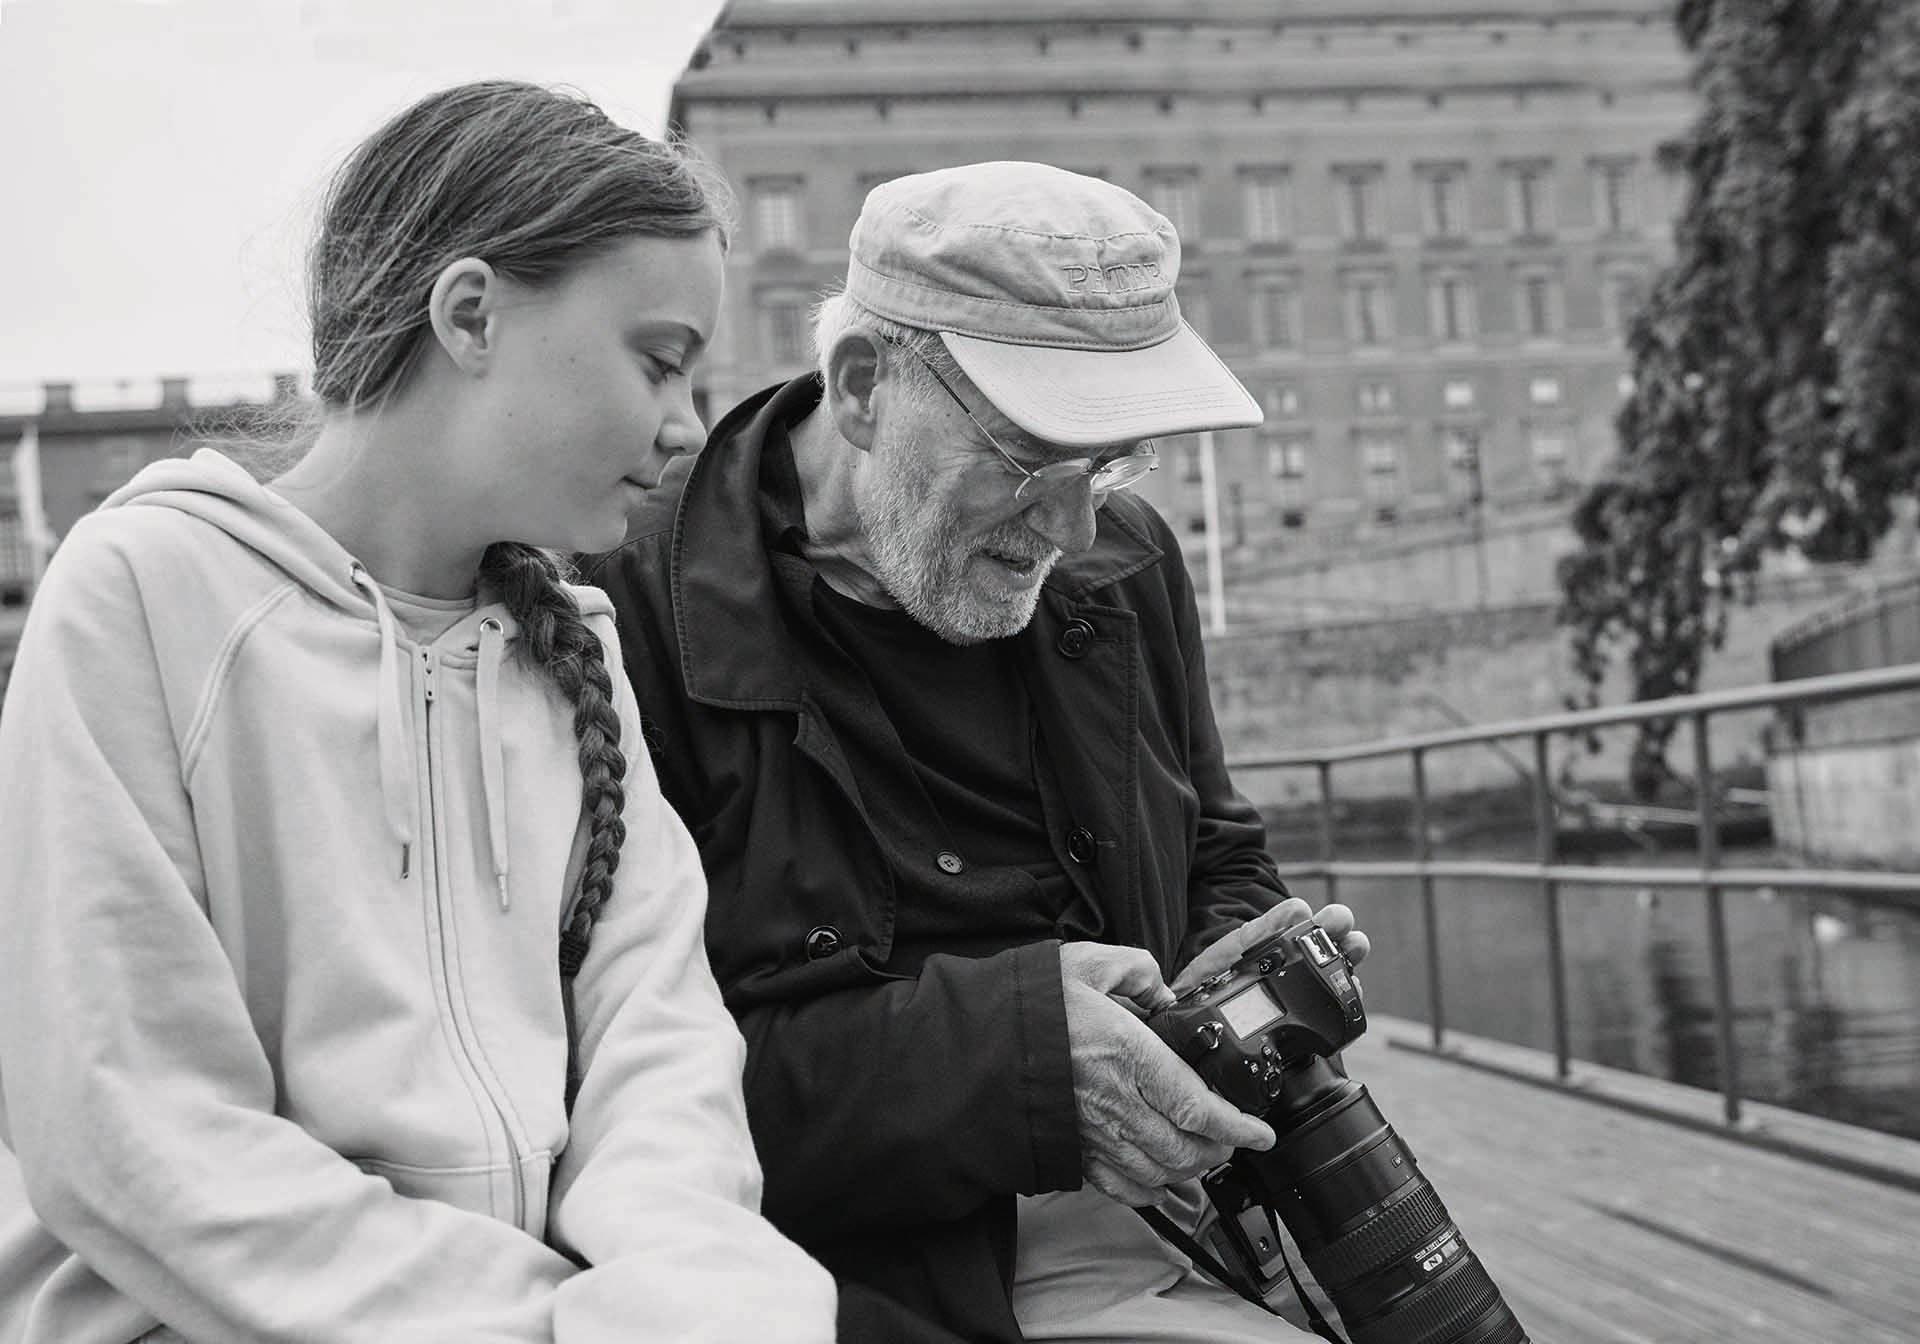 Peter Lindbergh és Greta Thunberg